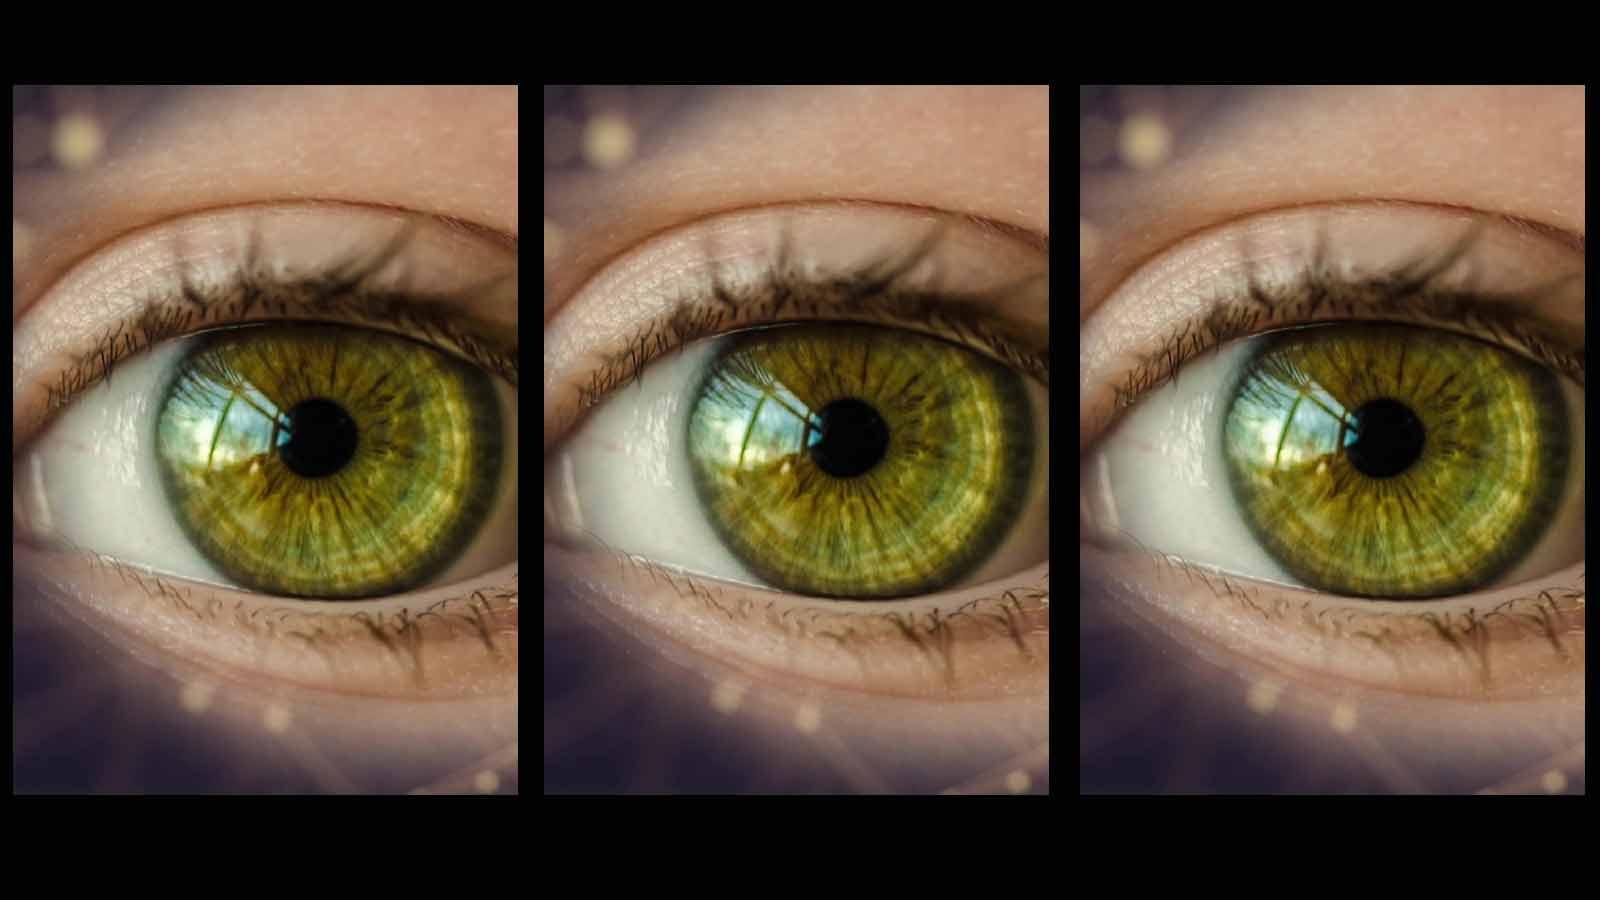 antibody-based-eye-drop-may-treat-dry-eye-disease-study